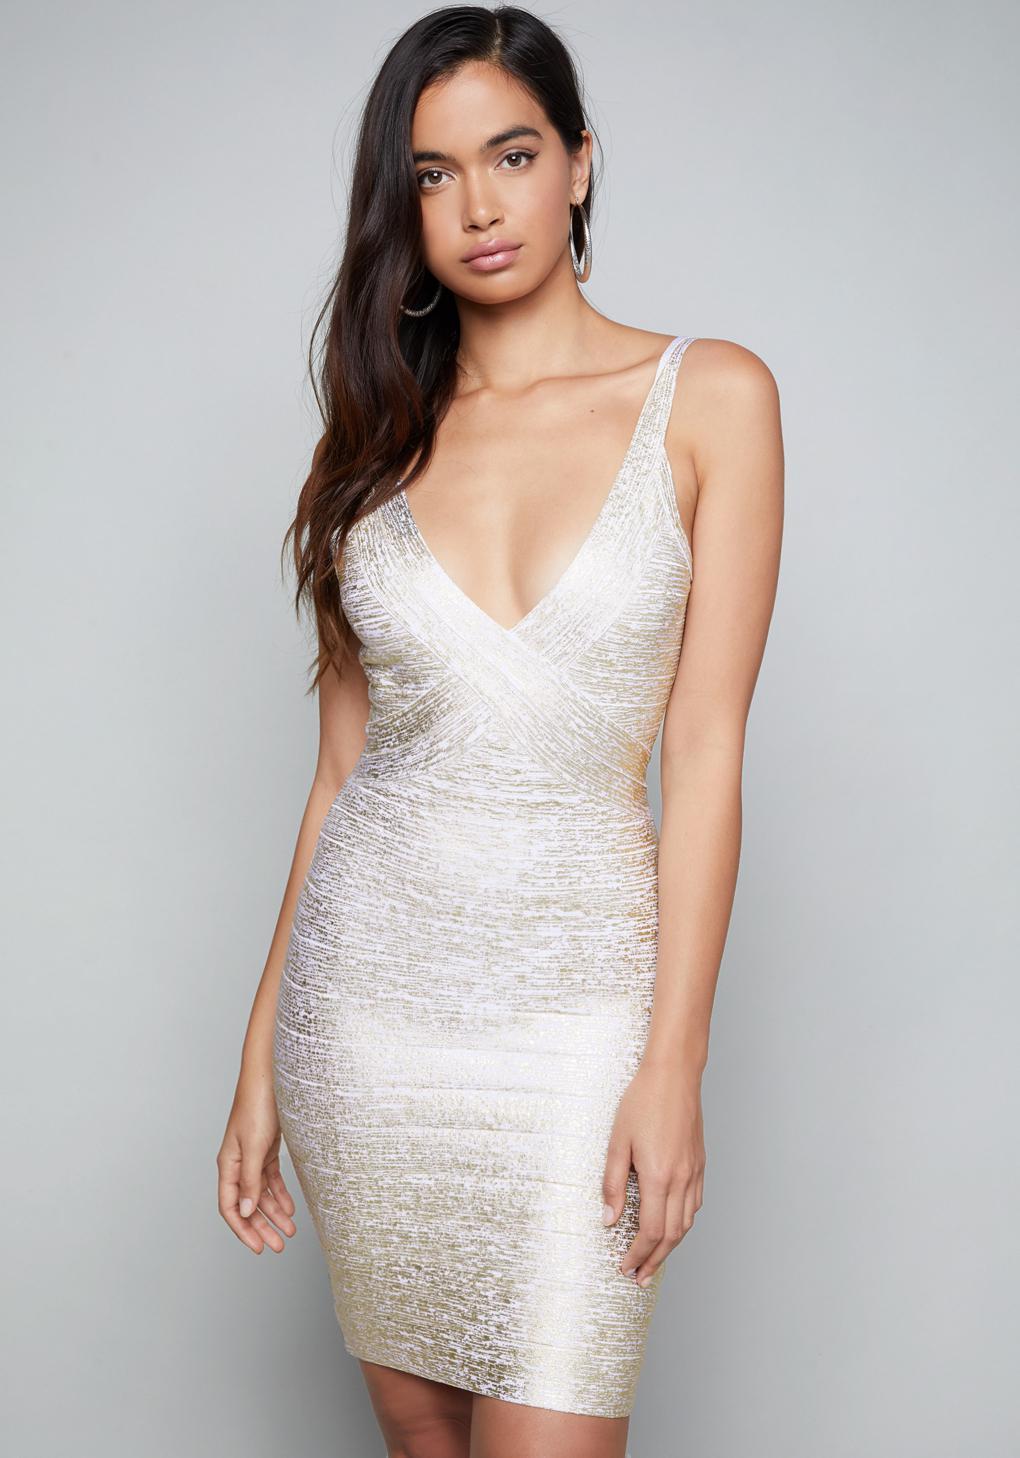 Bebe Gold Dress